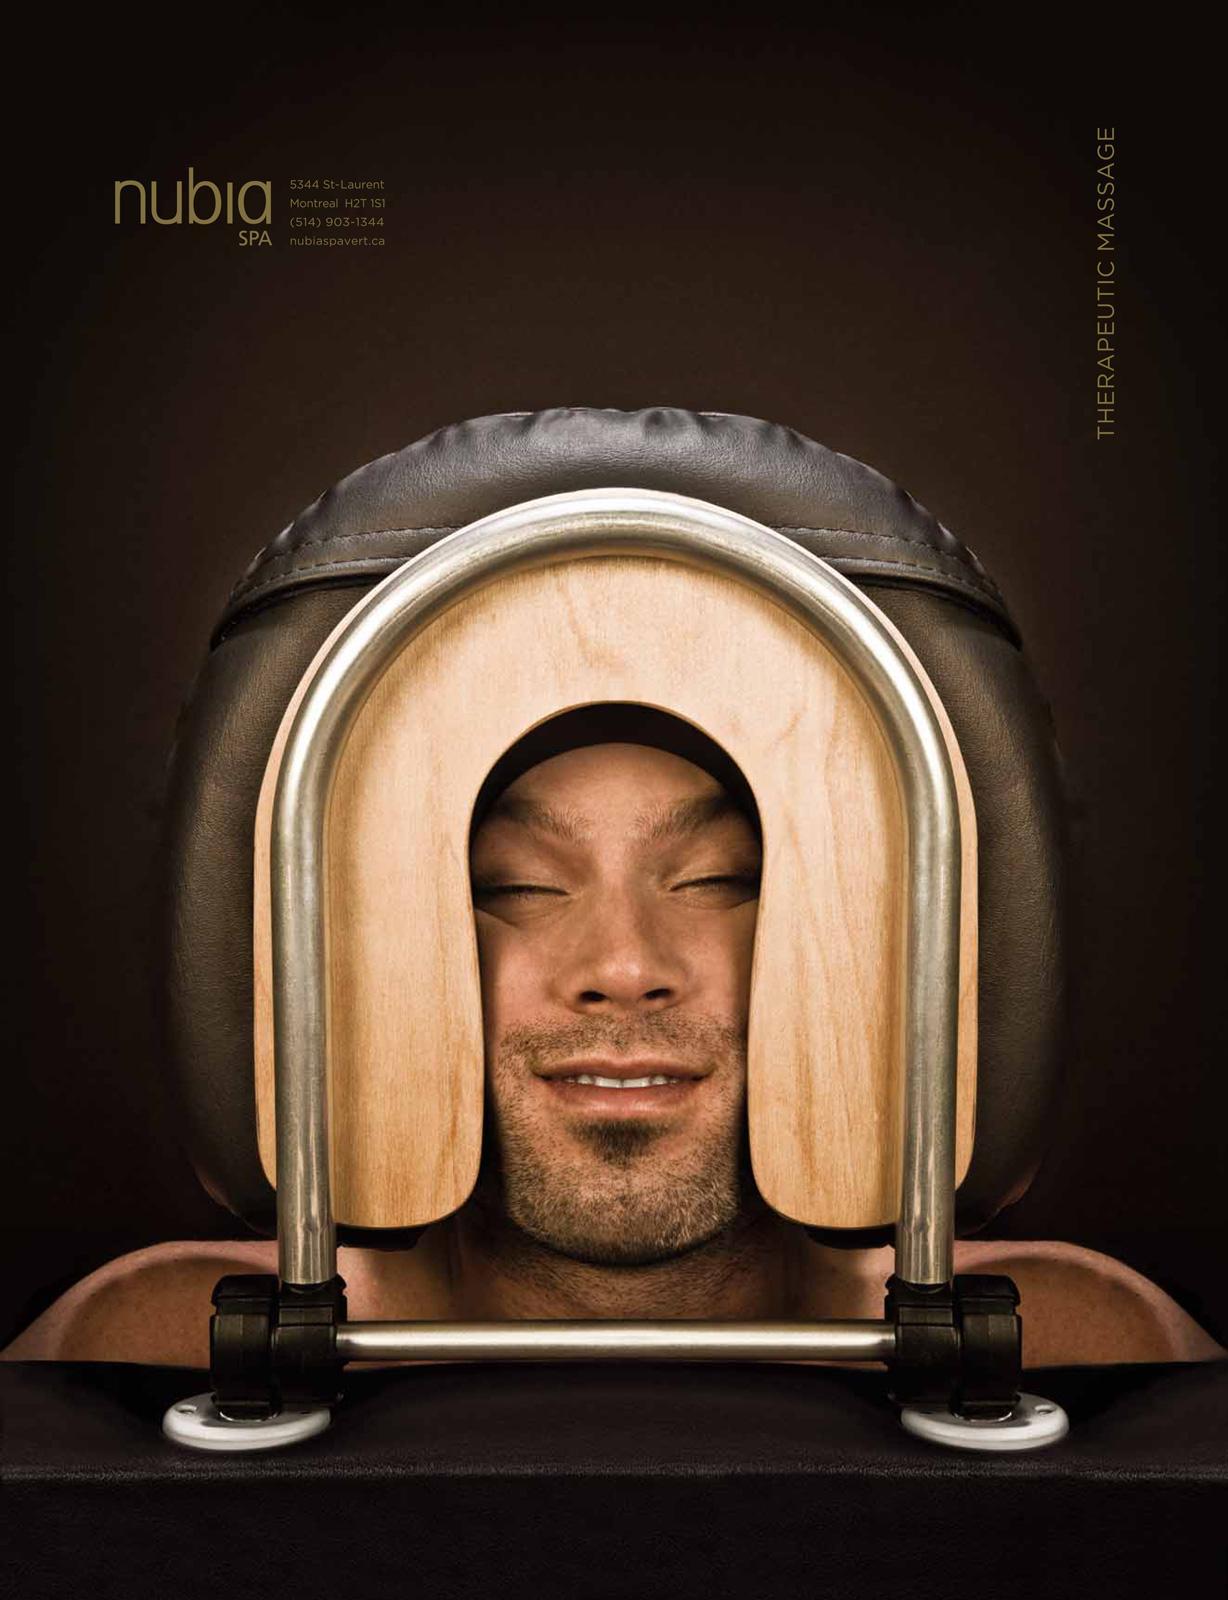 Nubia Green Spa Print Ad -  Man